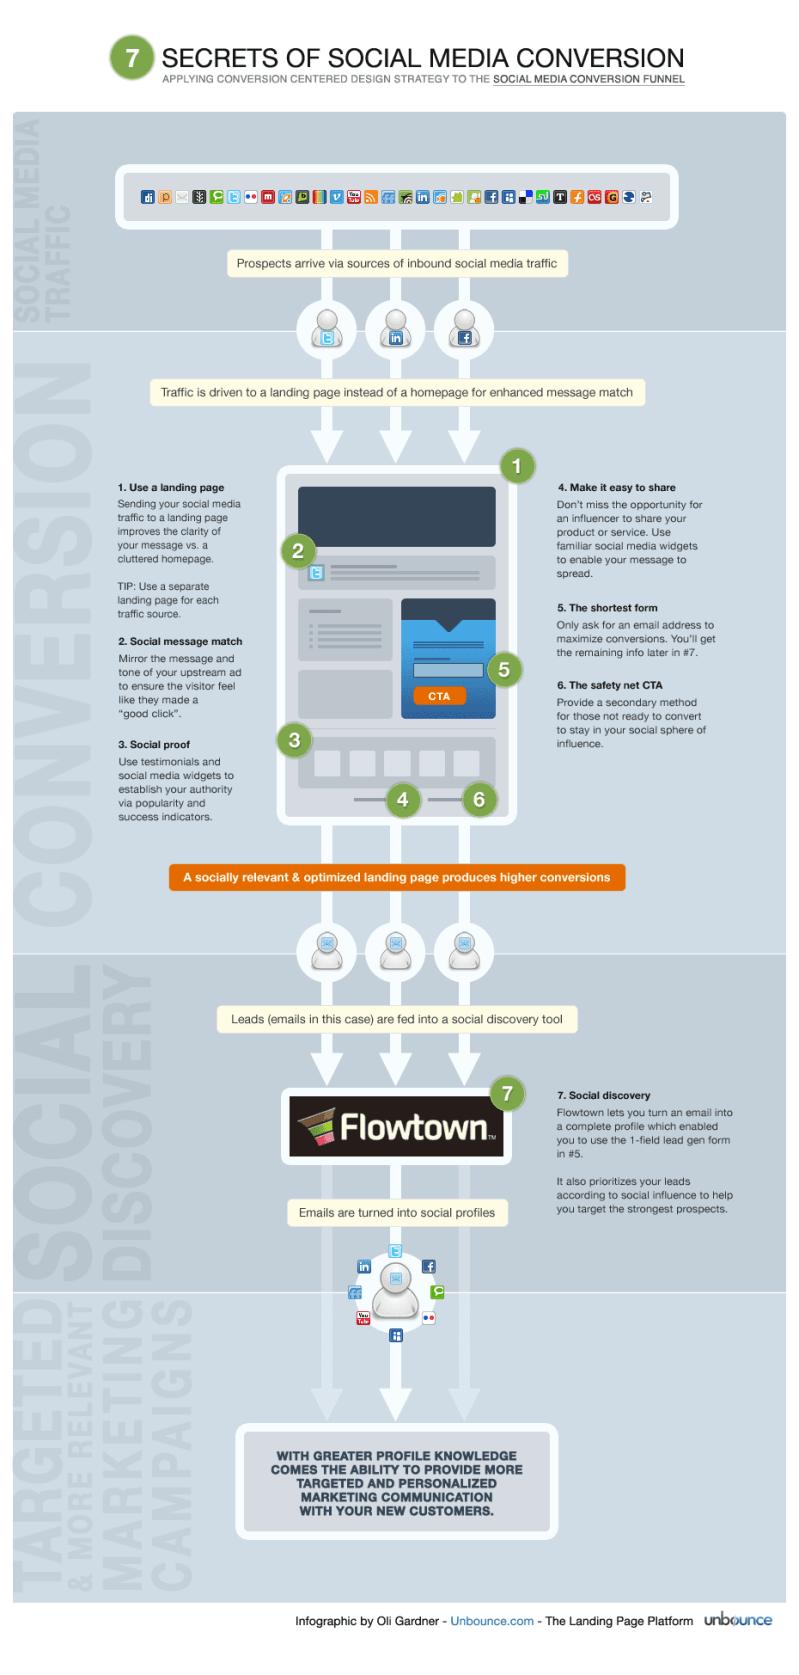 https://i1.wp.com/unbounce.com/photos/7-secrets-of-social-media-conversion-infographic1.png?w=800